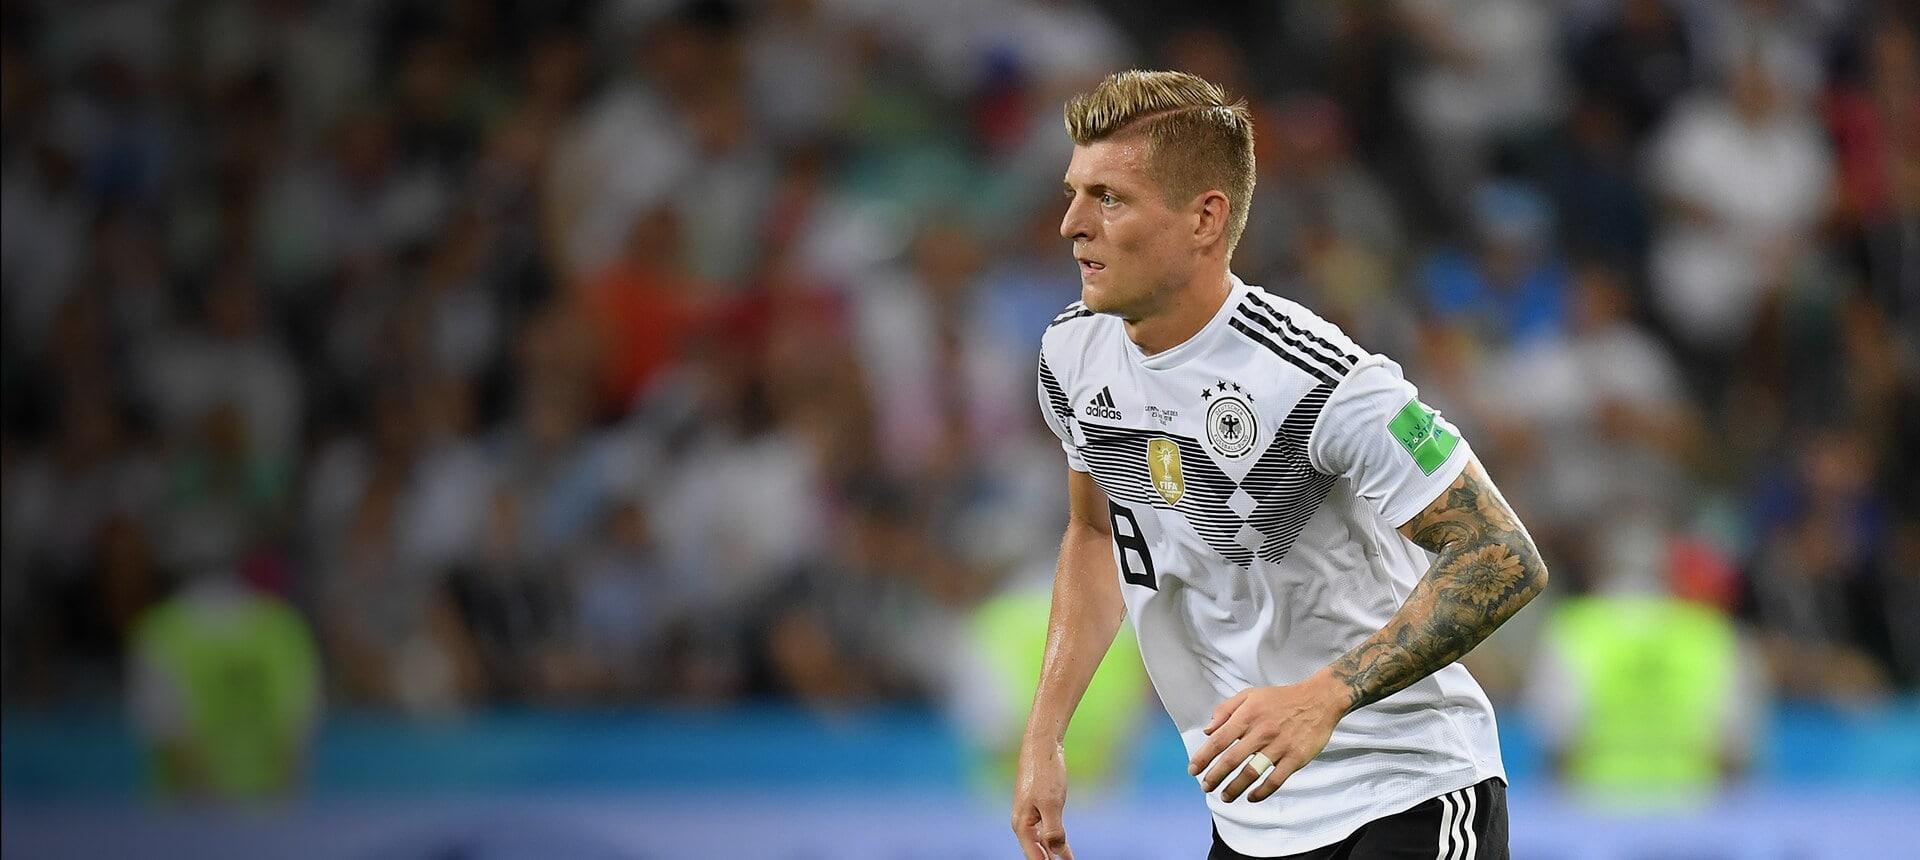 529bfb198 German National Team 2018 FIFA World Cup™